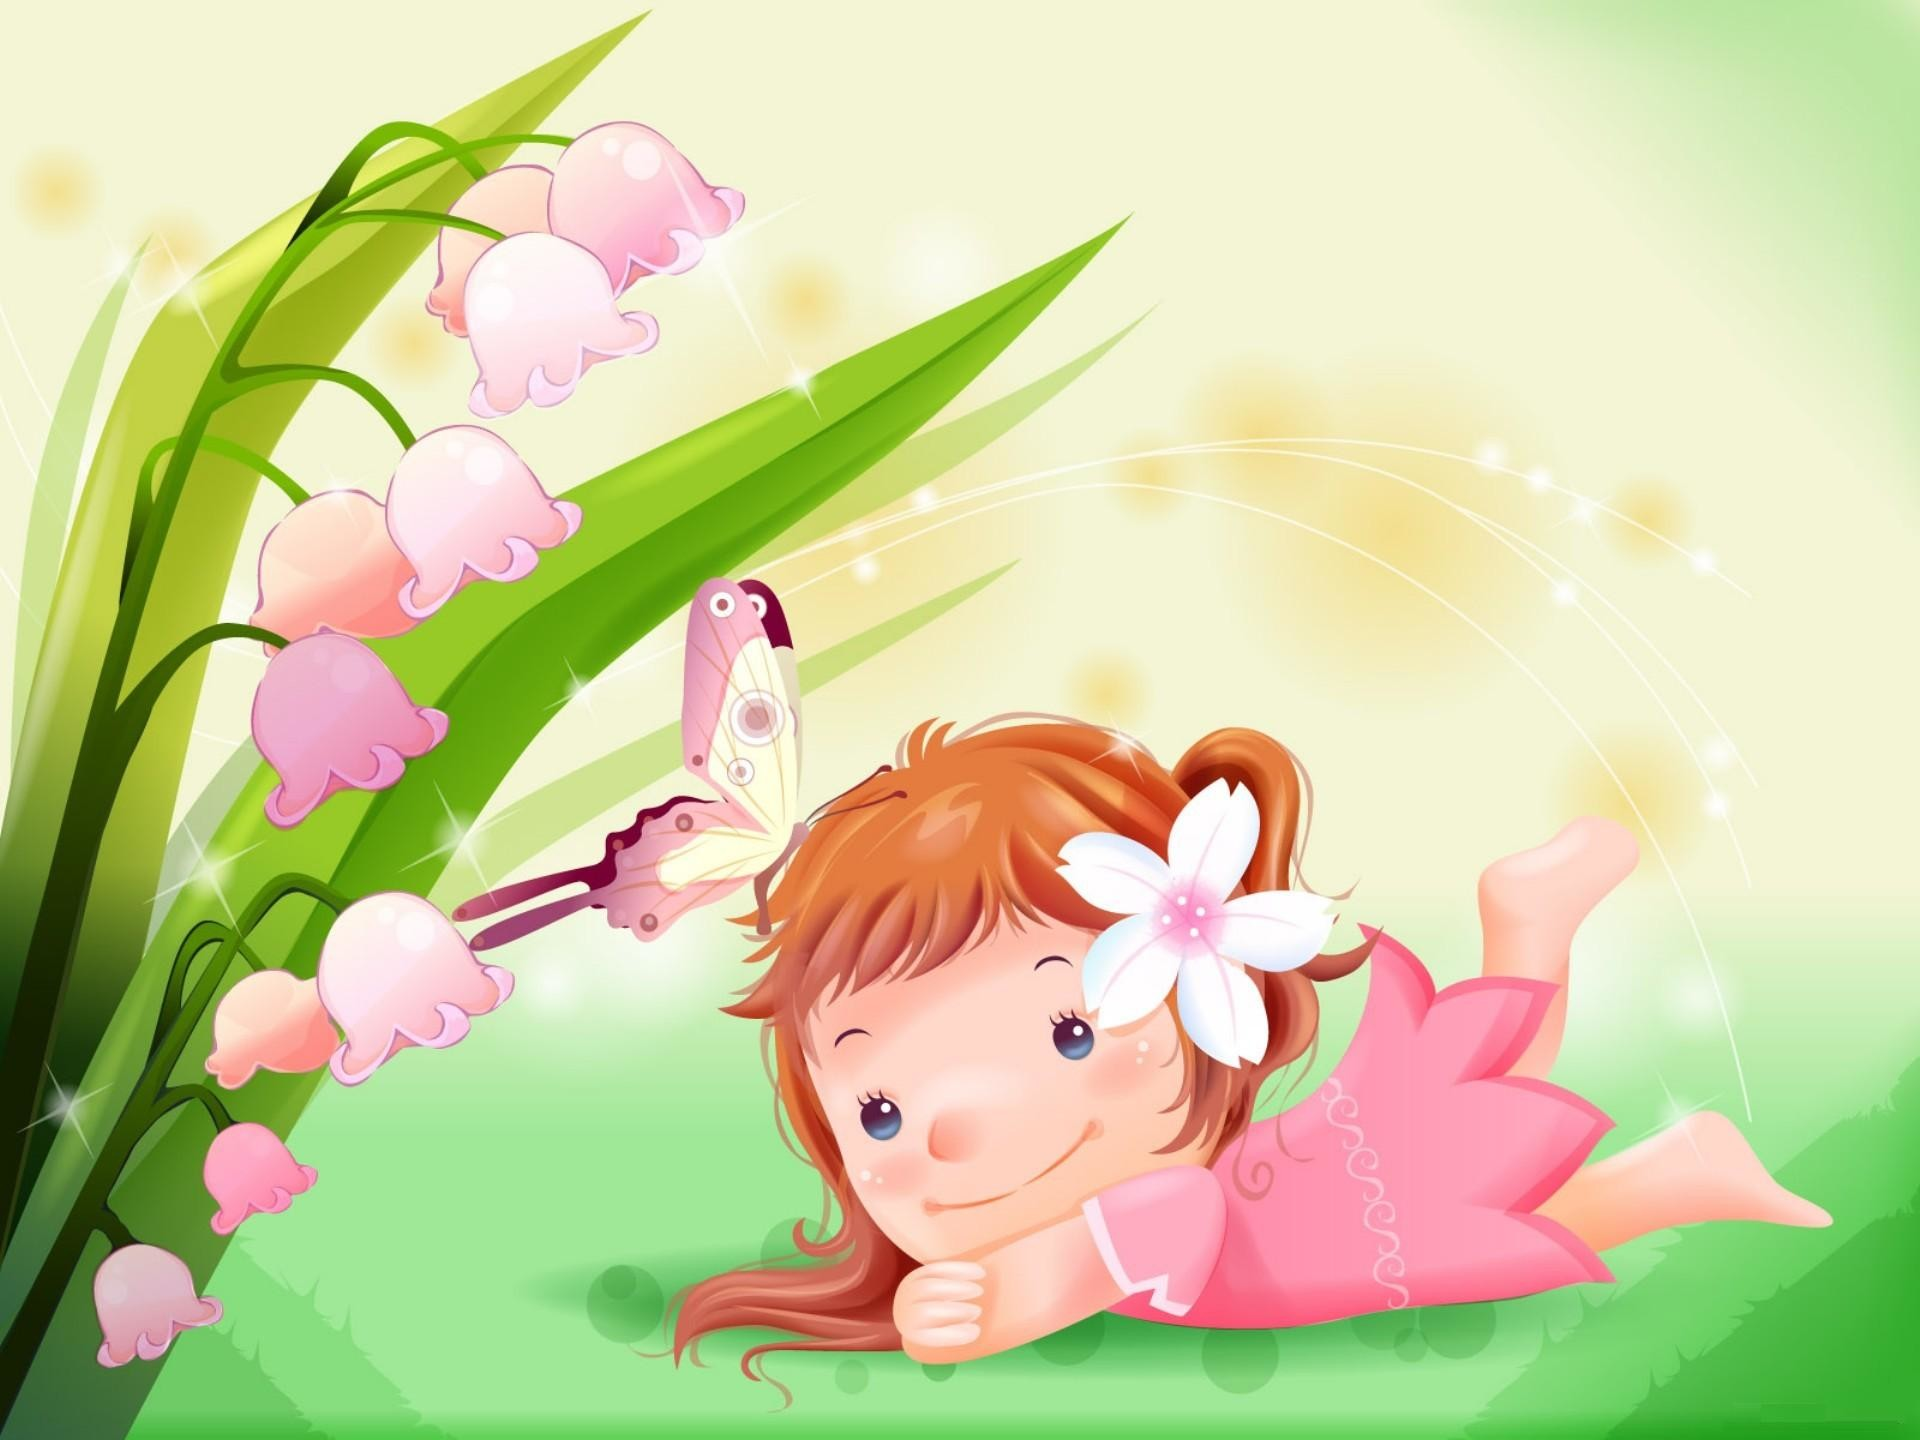 Cute Little Girl with Butterfly Cartoon Wallpaper